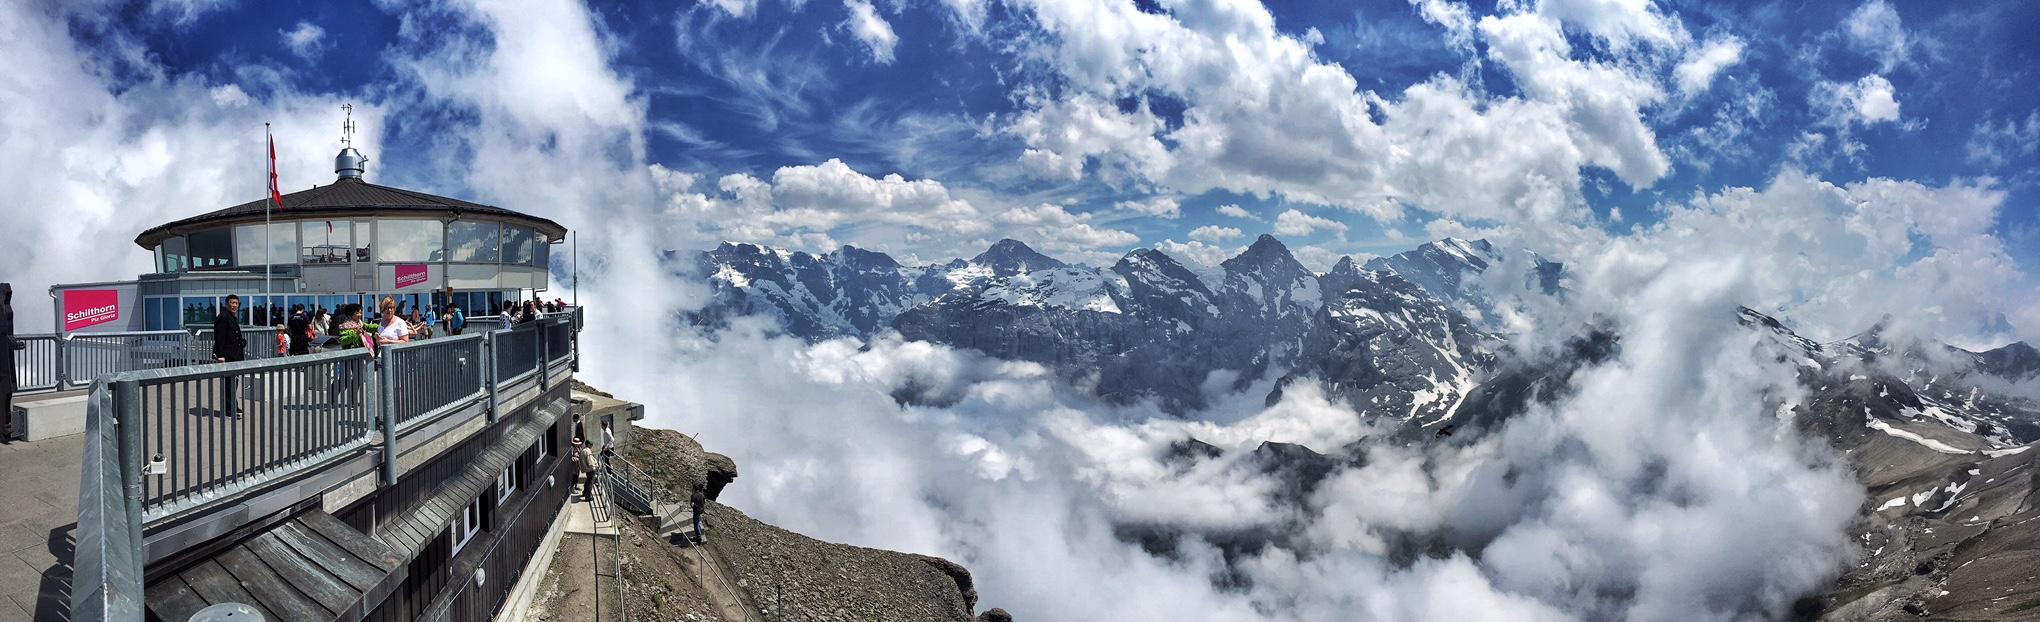 Schilthorn Switzerland 007 Panorama Views Abstract Heaven